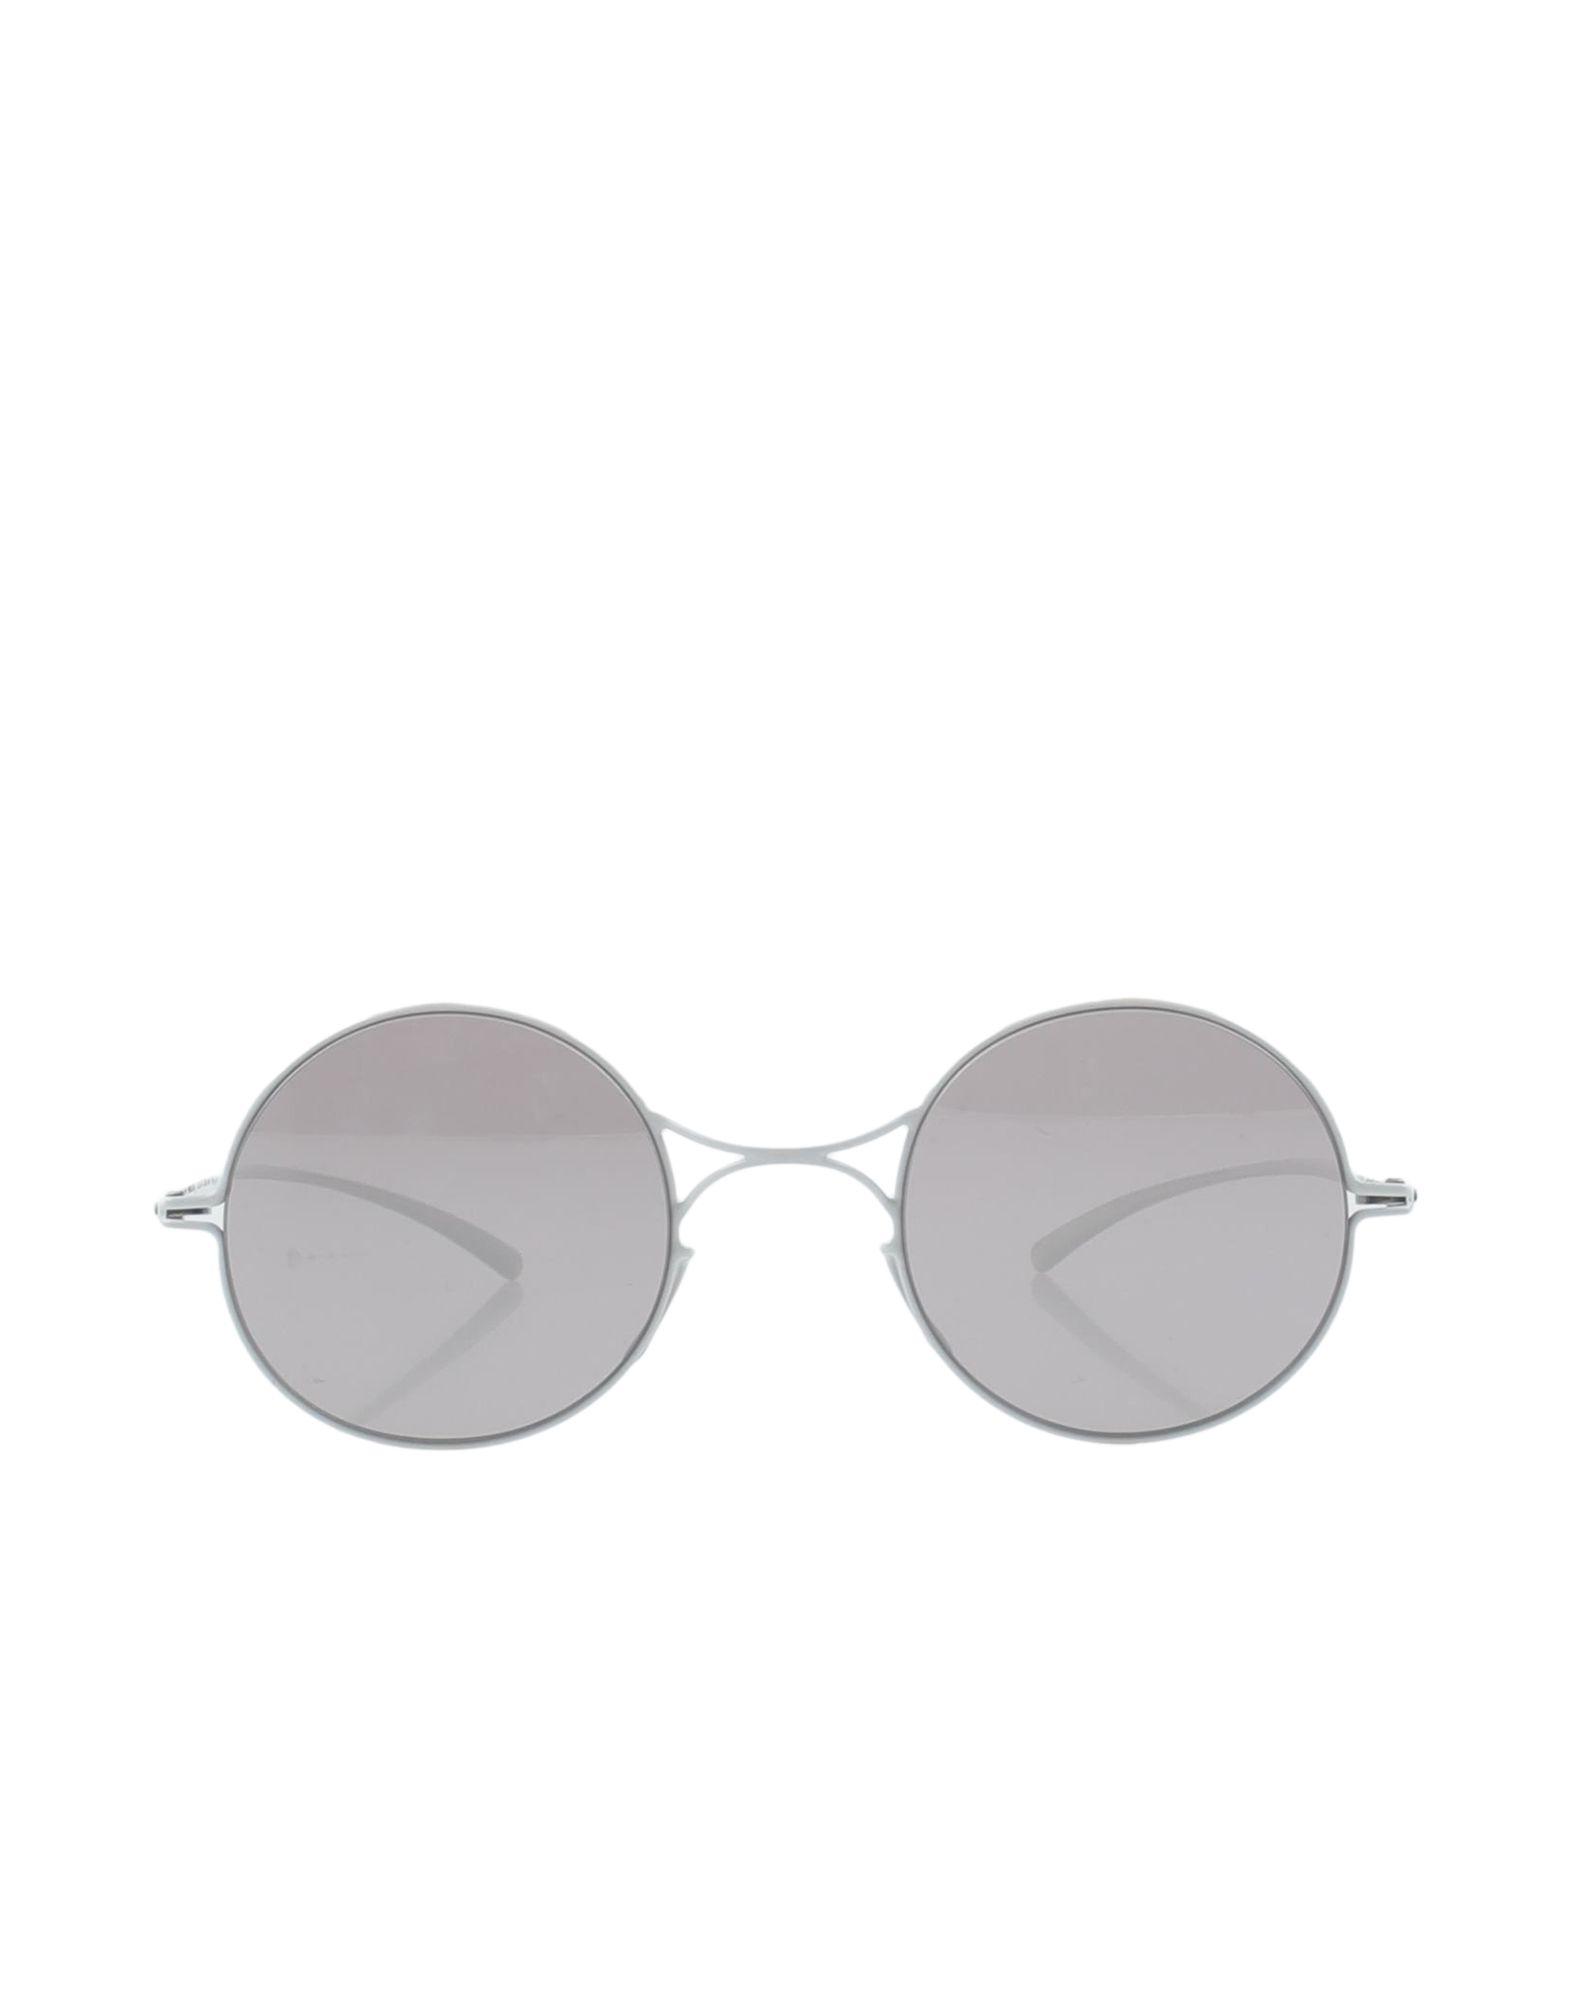 MYKITA + MAISON MARGIELA Солнечные очки